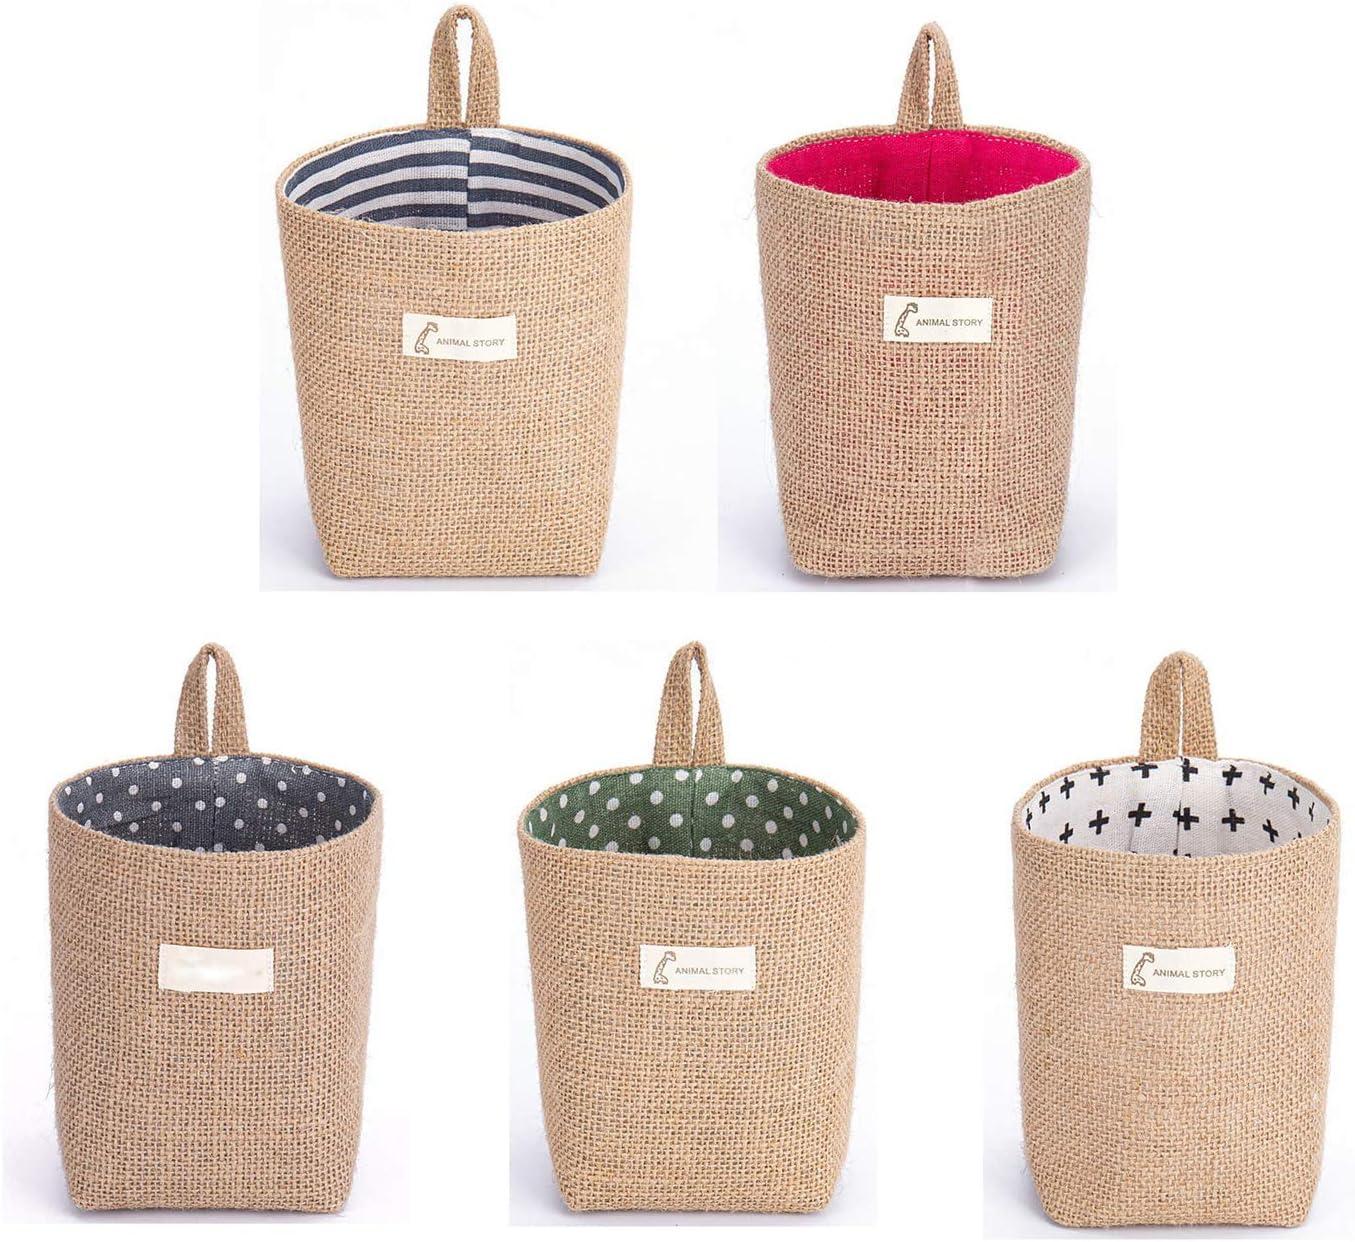 LGYKUMEG 5pcs Mini Max 90% OFF Hanging Storage Bag Linen Year-end gift Small Cotton Wall